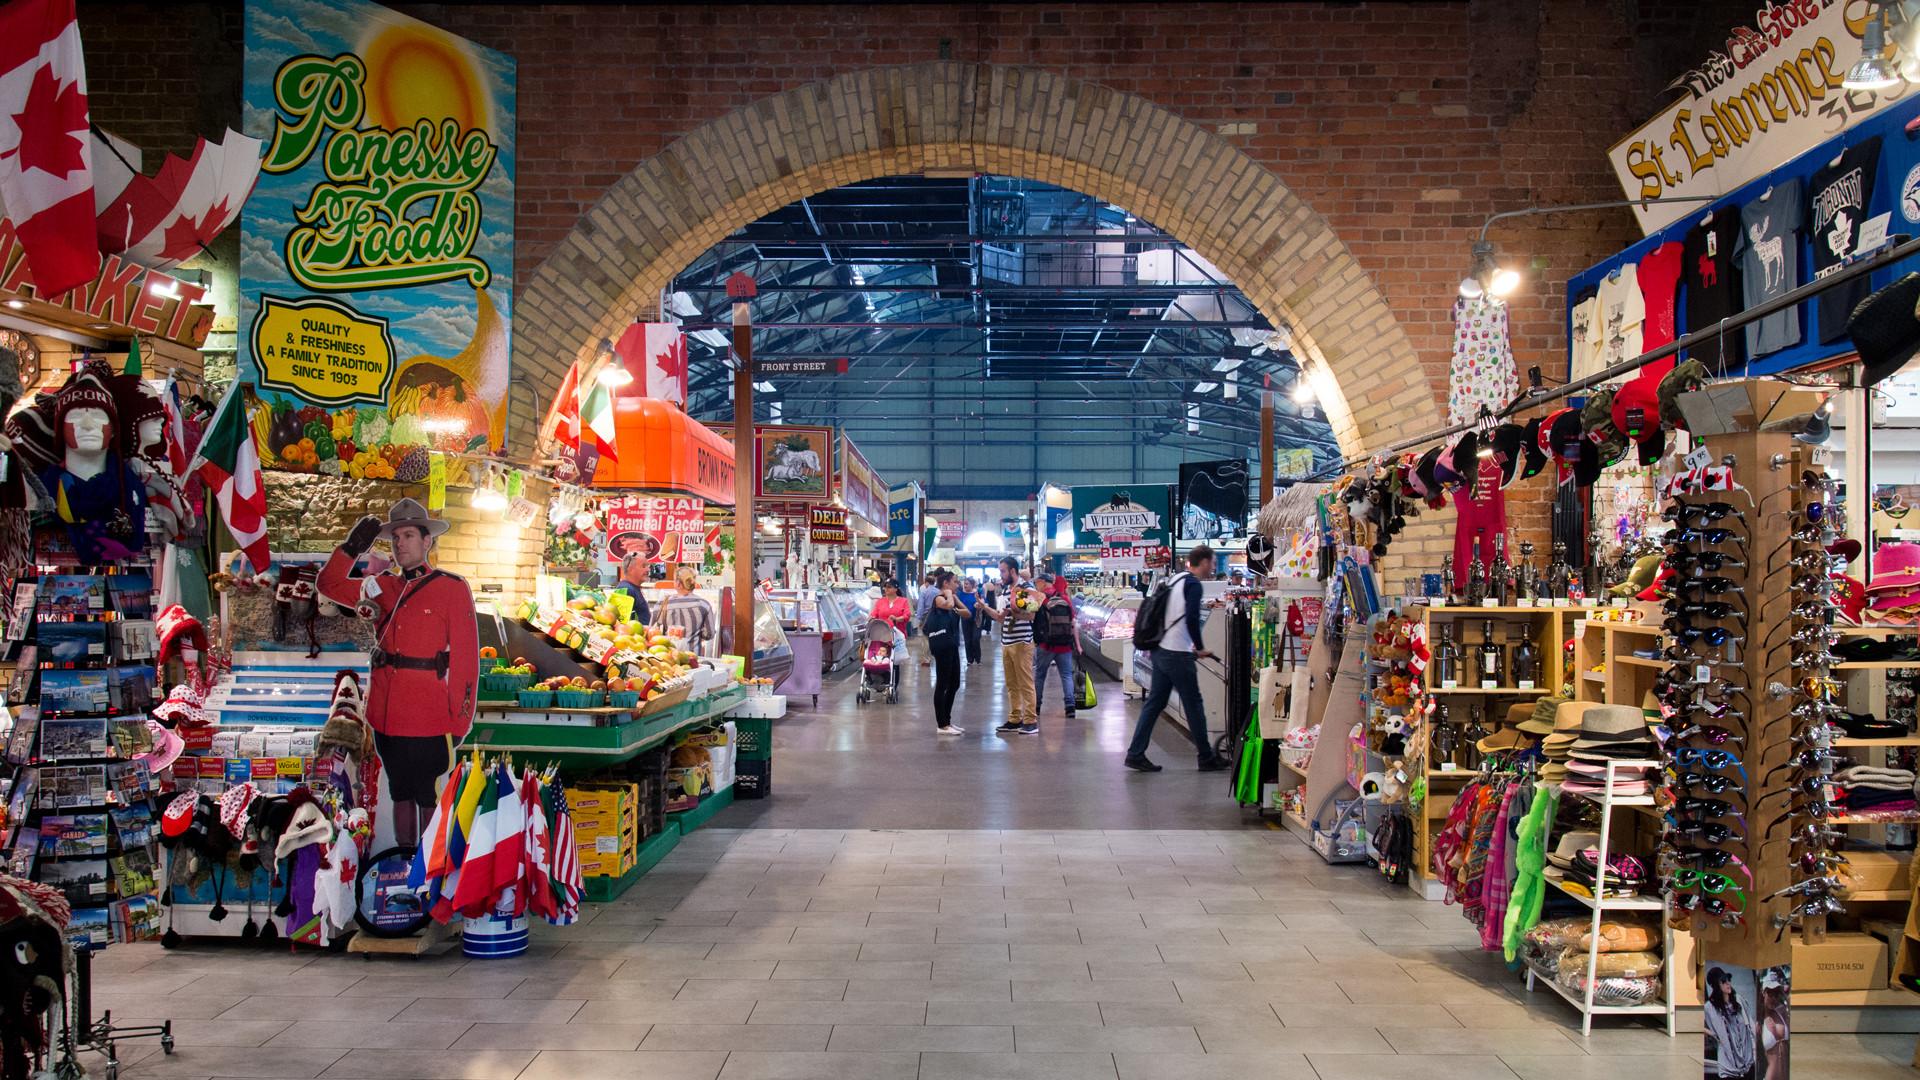 St. Lawrence Market, Toronto